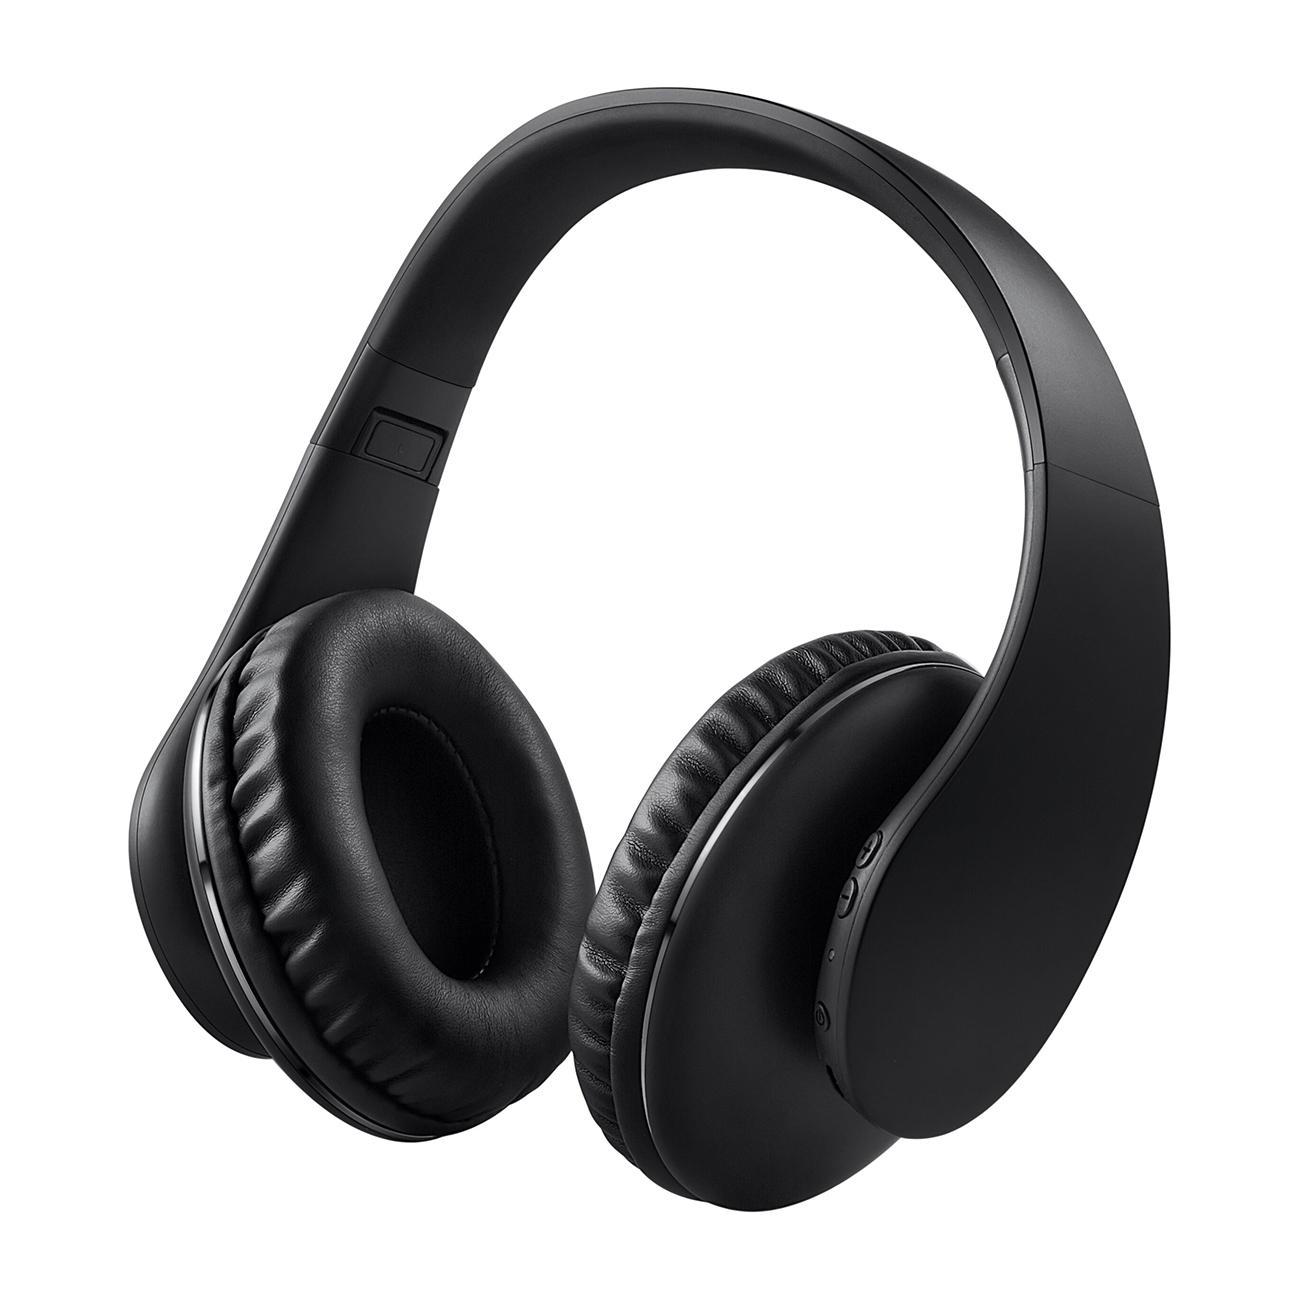 HearMore TV Wireless Rechargeable Headphones